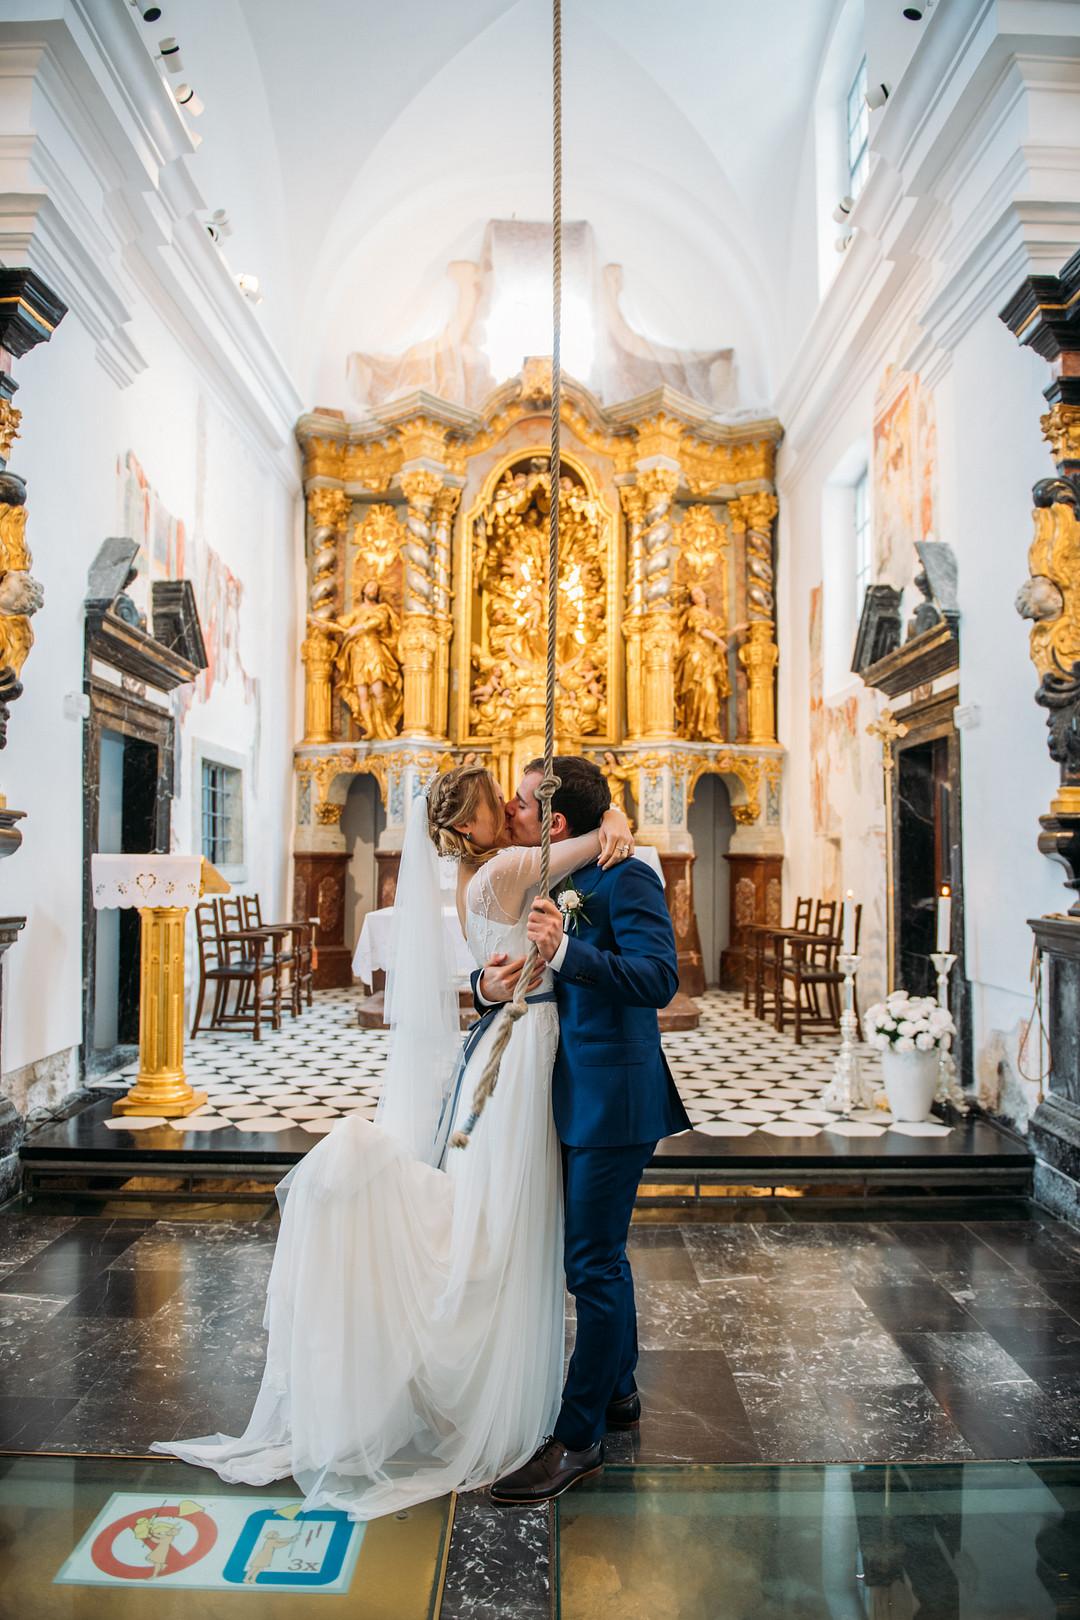 Orthodox Wedding in Bled